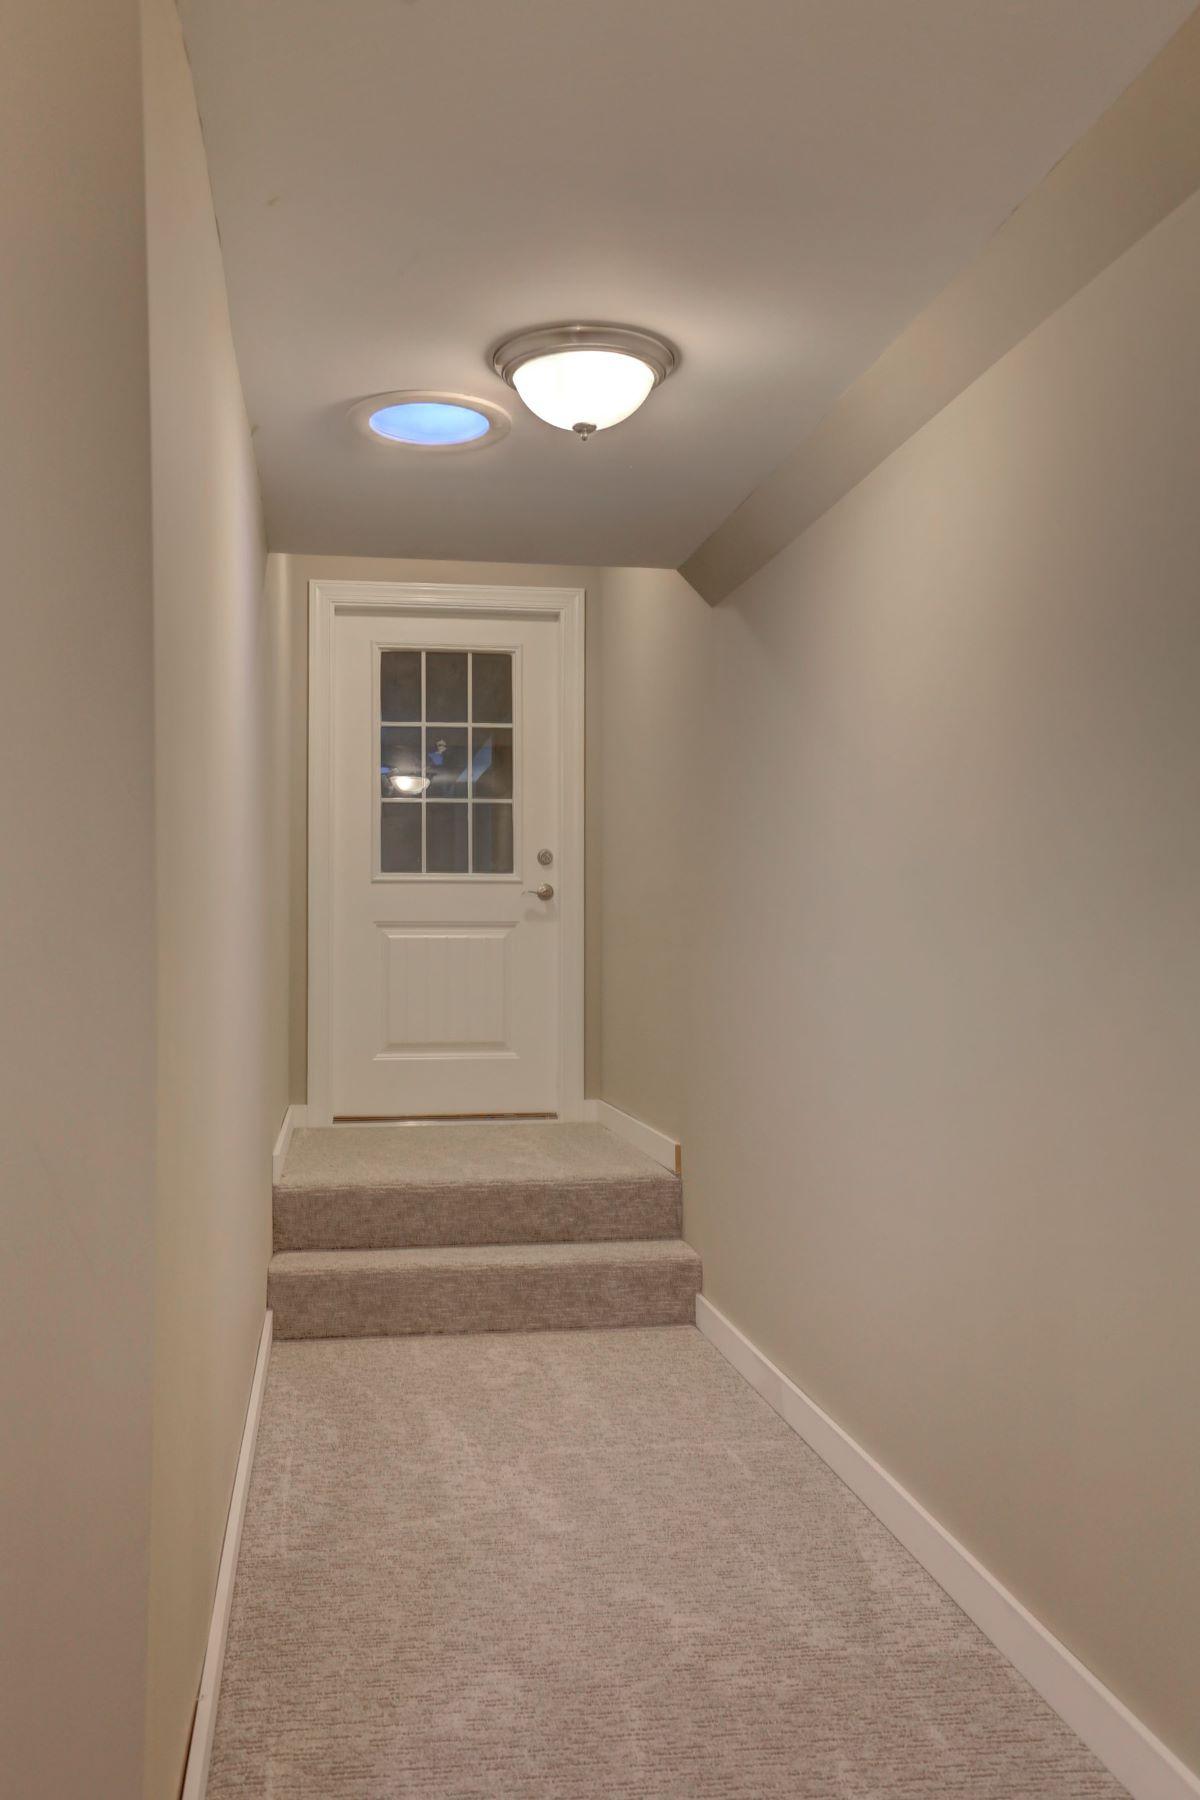 Additional photo for property listing at 5 Joann Lane 5 Joann Lane Pequea, Pennsylvania 17565 United States